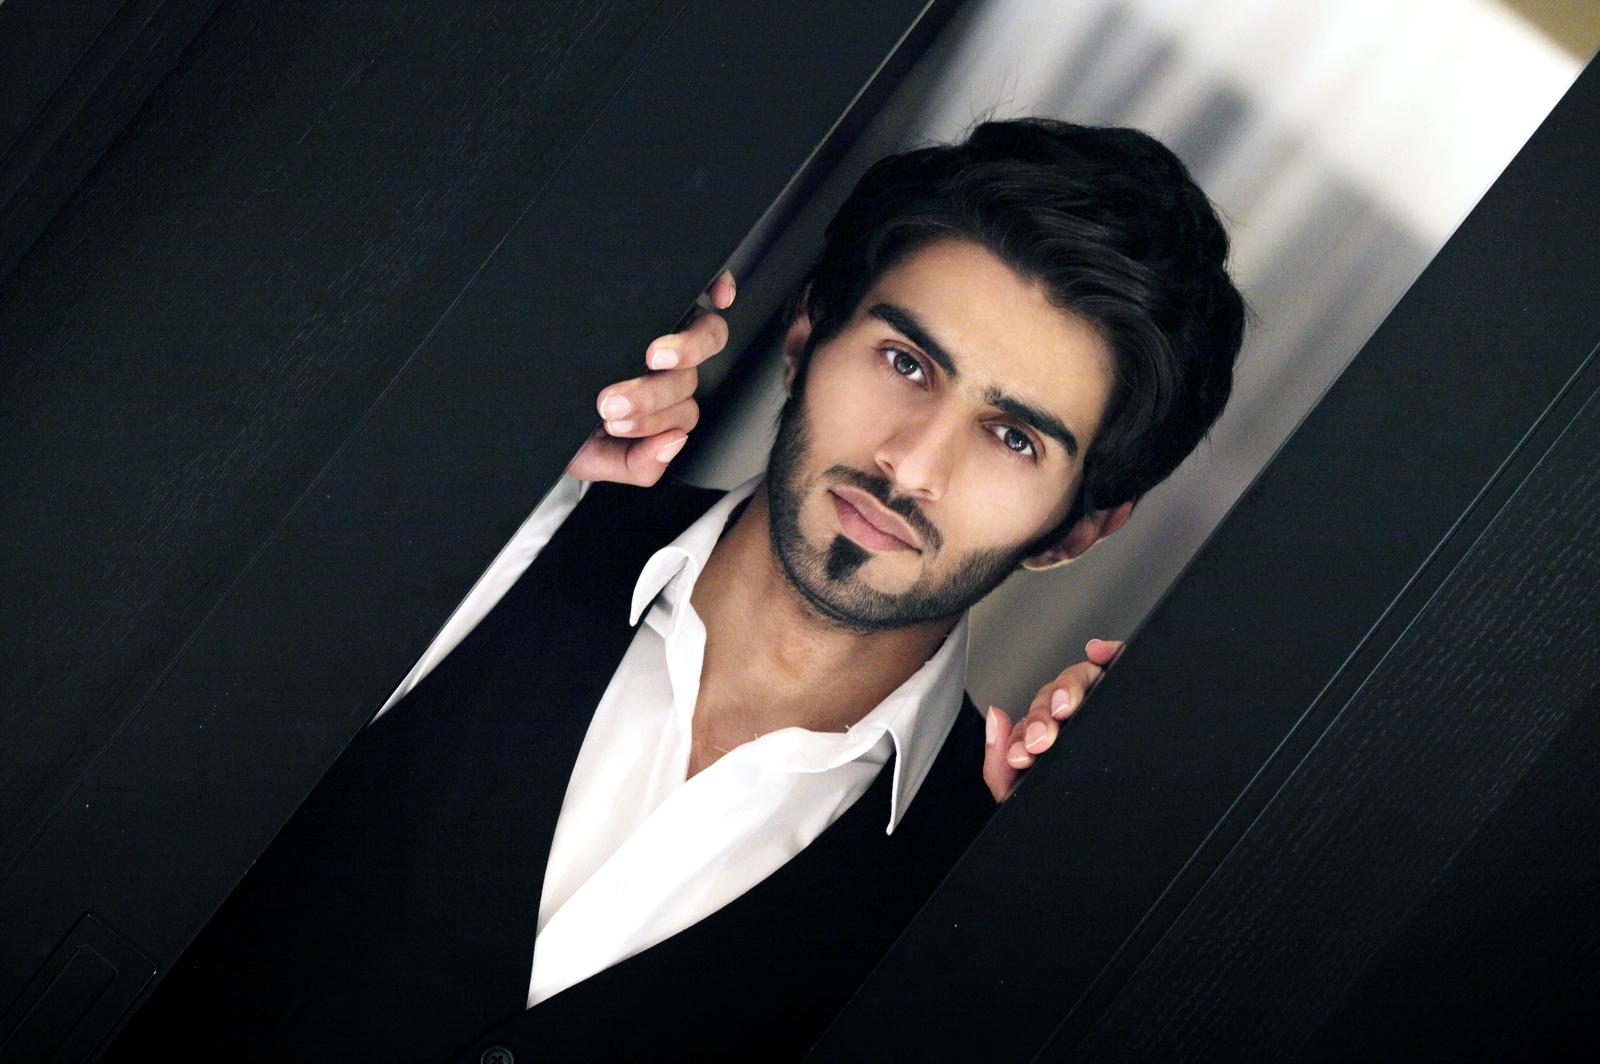 Omar Al Emadi